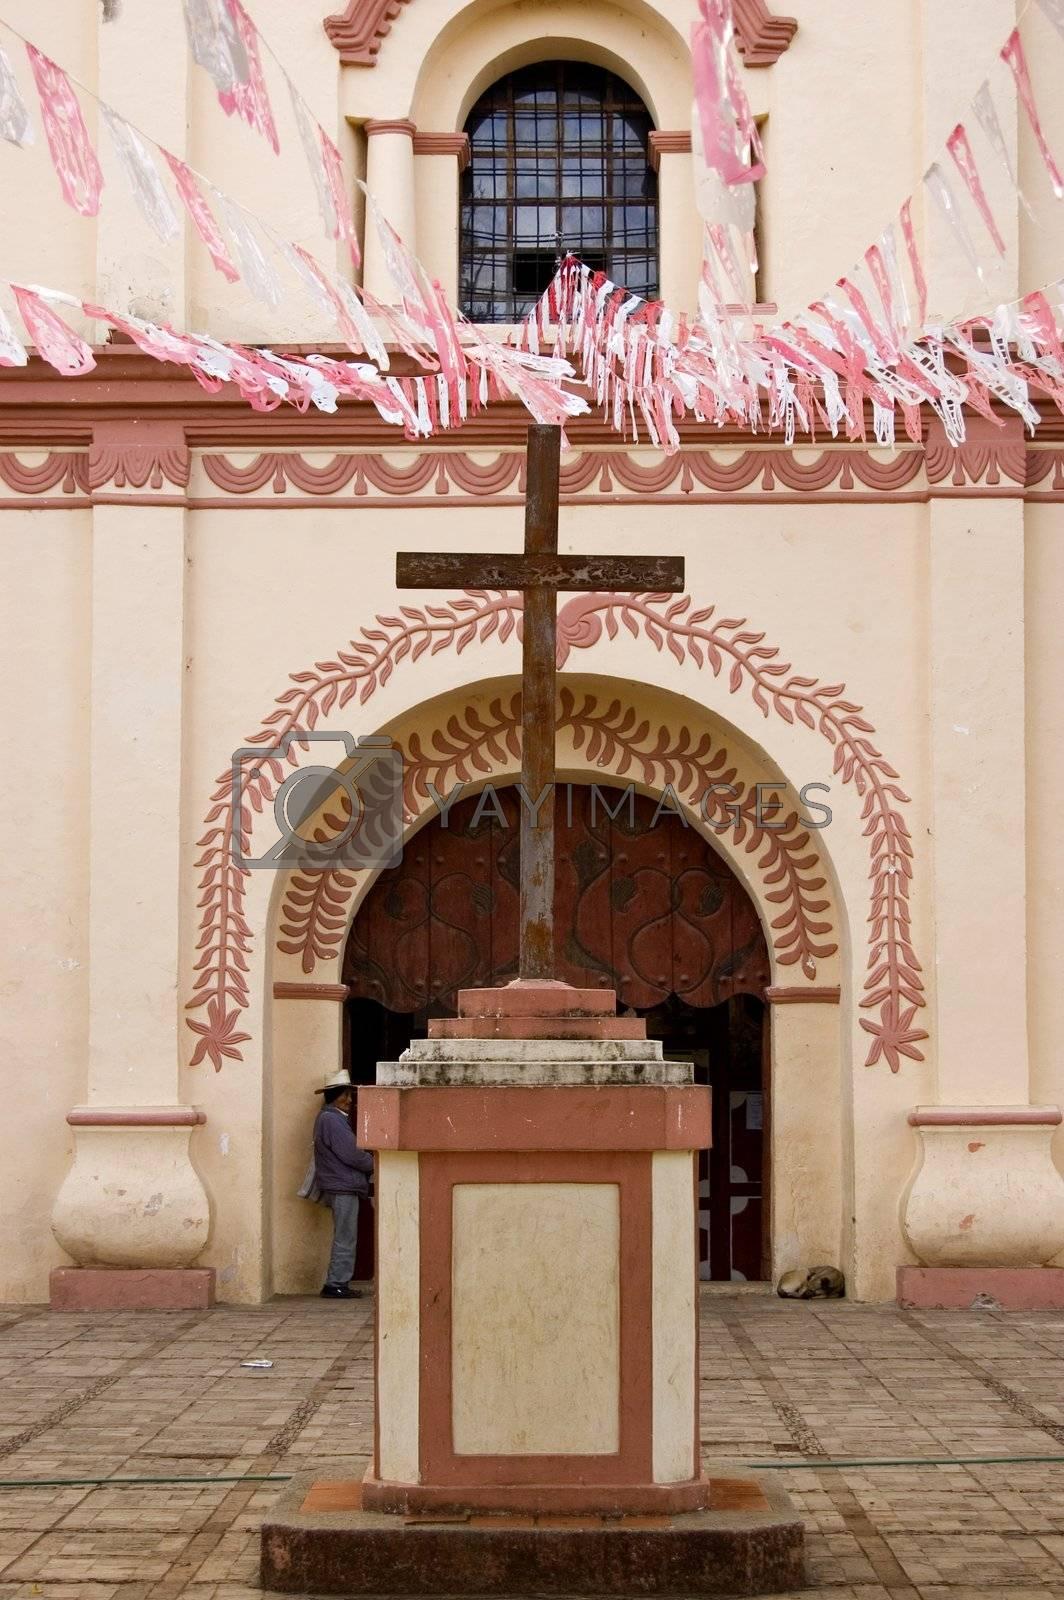 Cross in Chiapas by jorgeinthewater